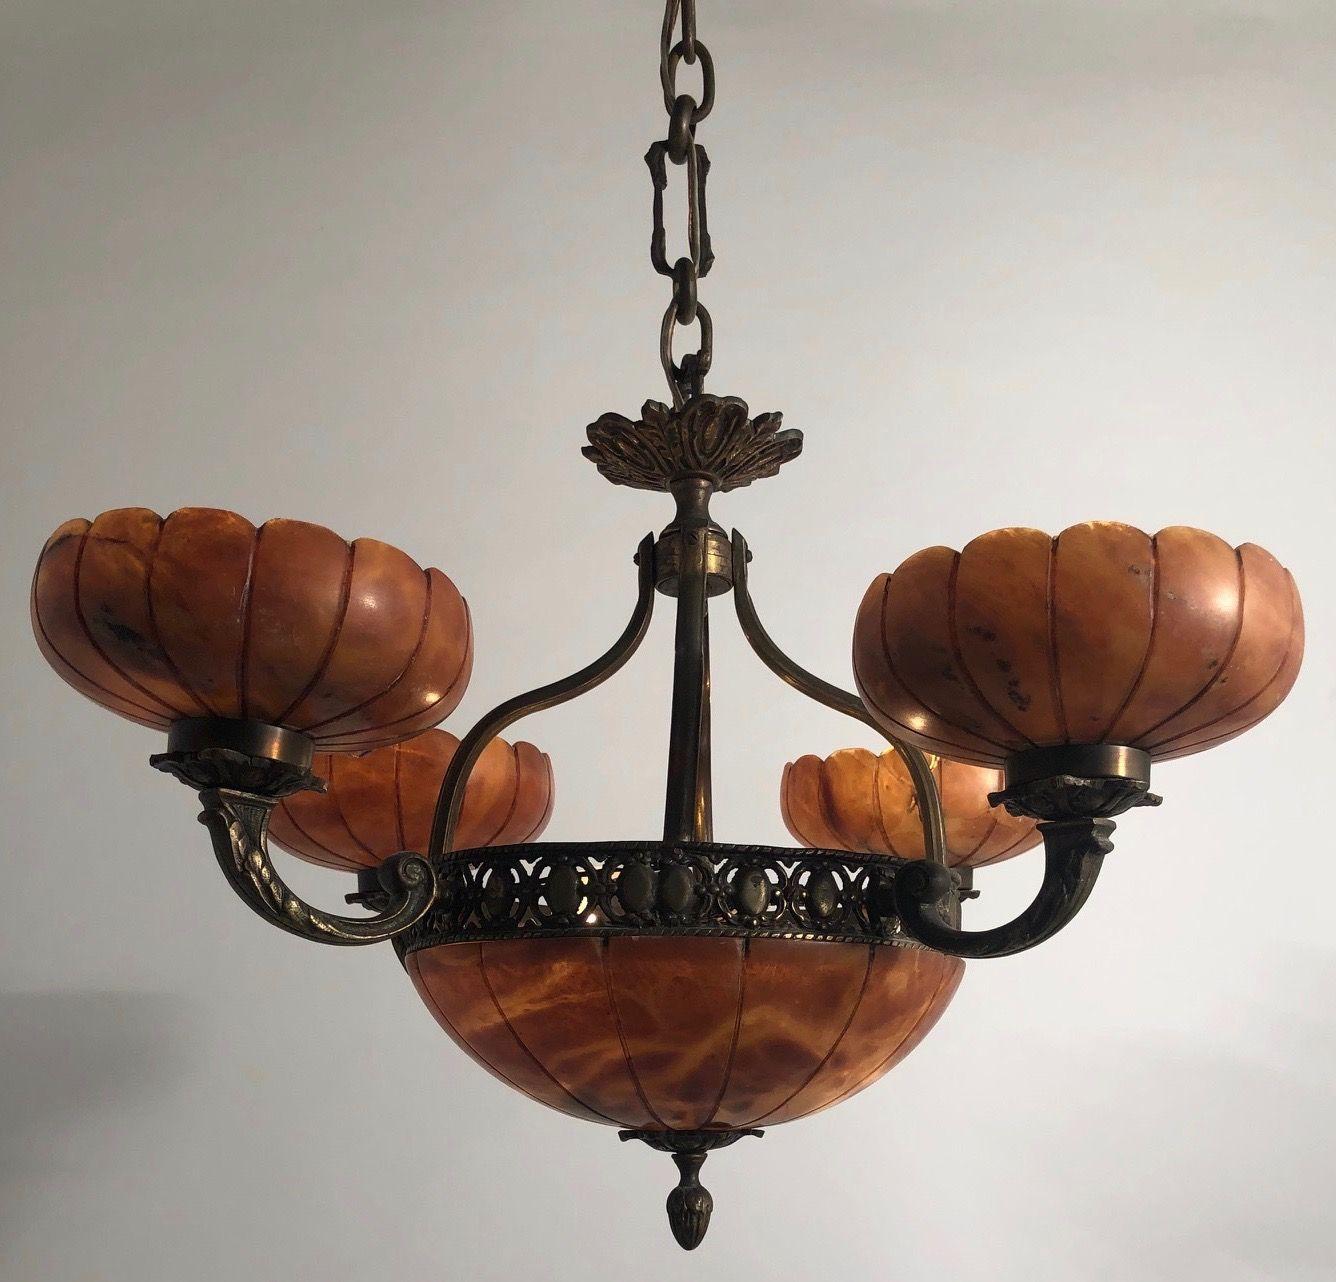 6 Light Bronze And Amber Alabaster Chandelier C 1930 Chandelier Chandelier Decor Glass Light Covers